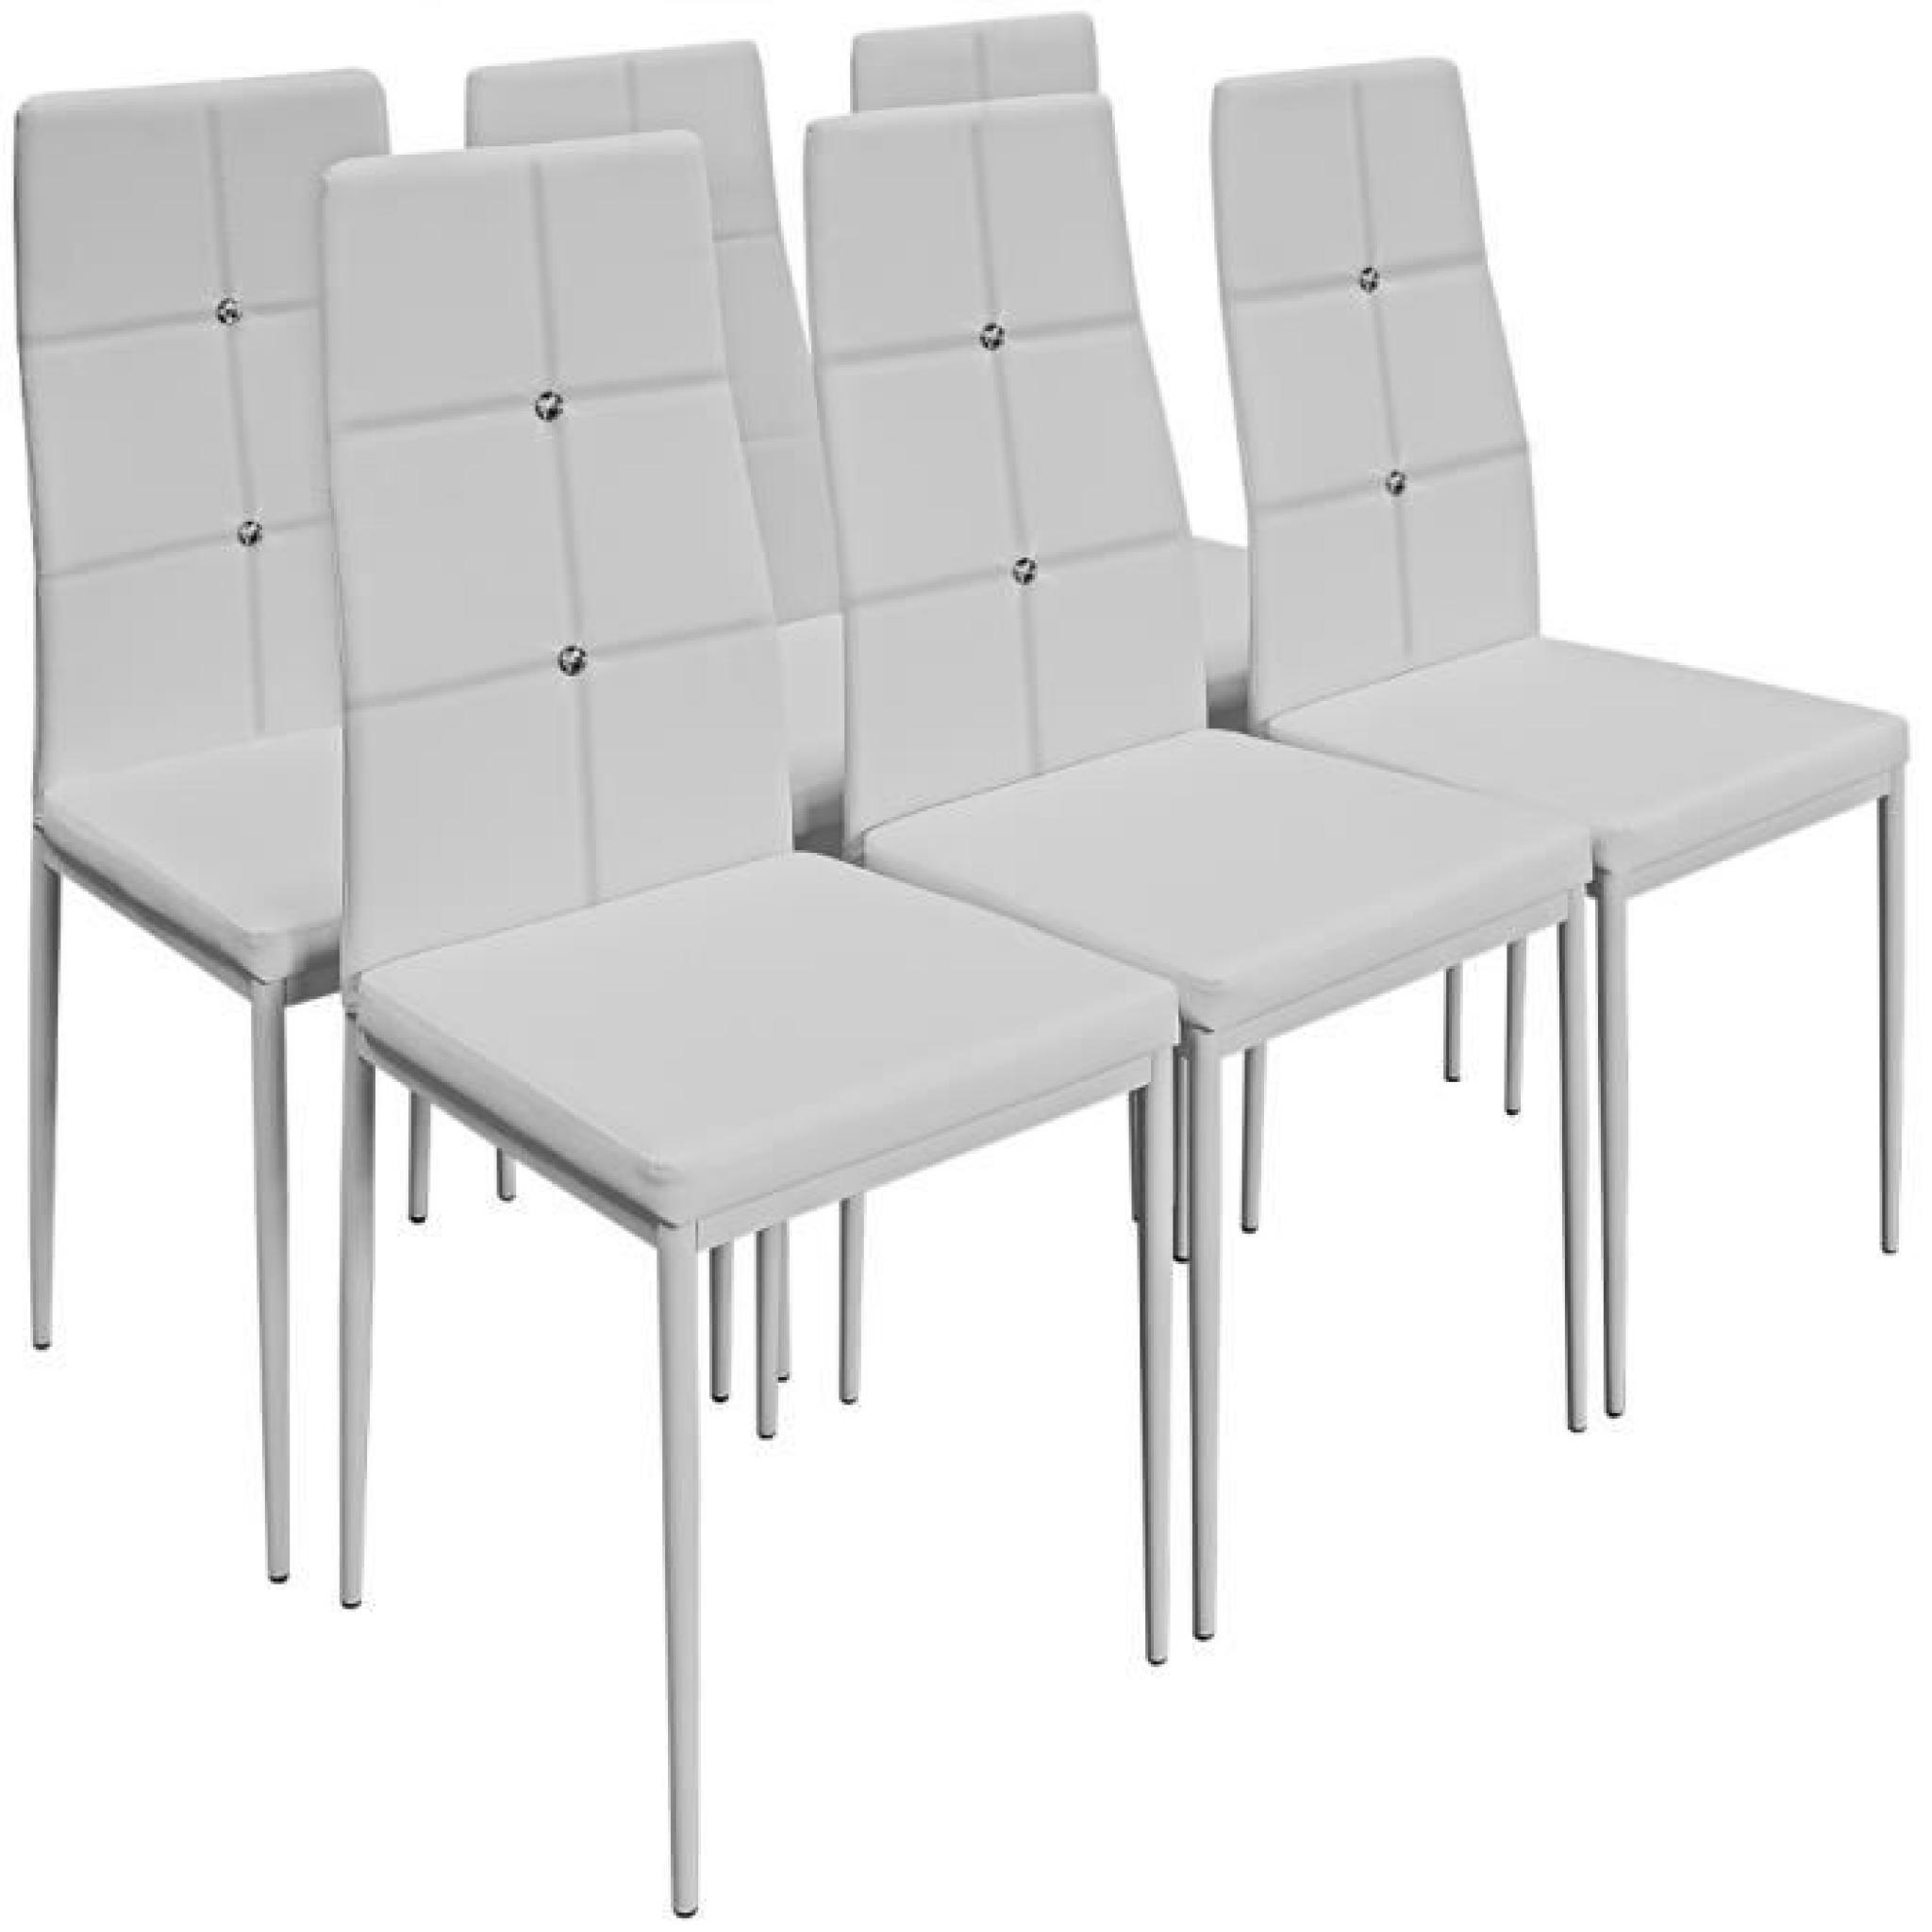 6x chaises de salle a manger avec strass noires achat for Meuble salle À manger avec achat chaise salle a manger